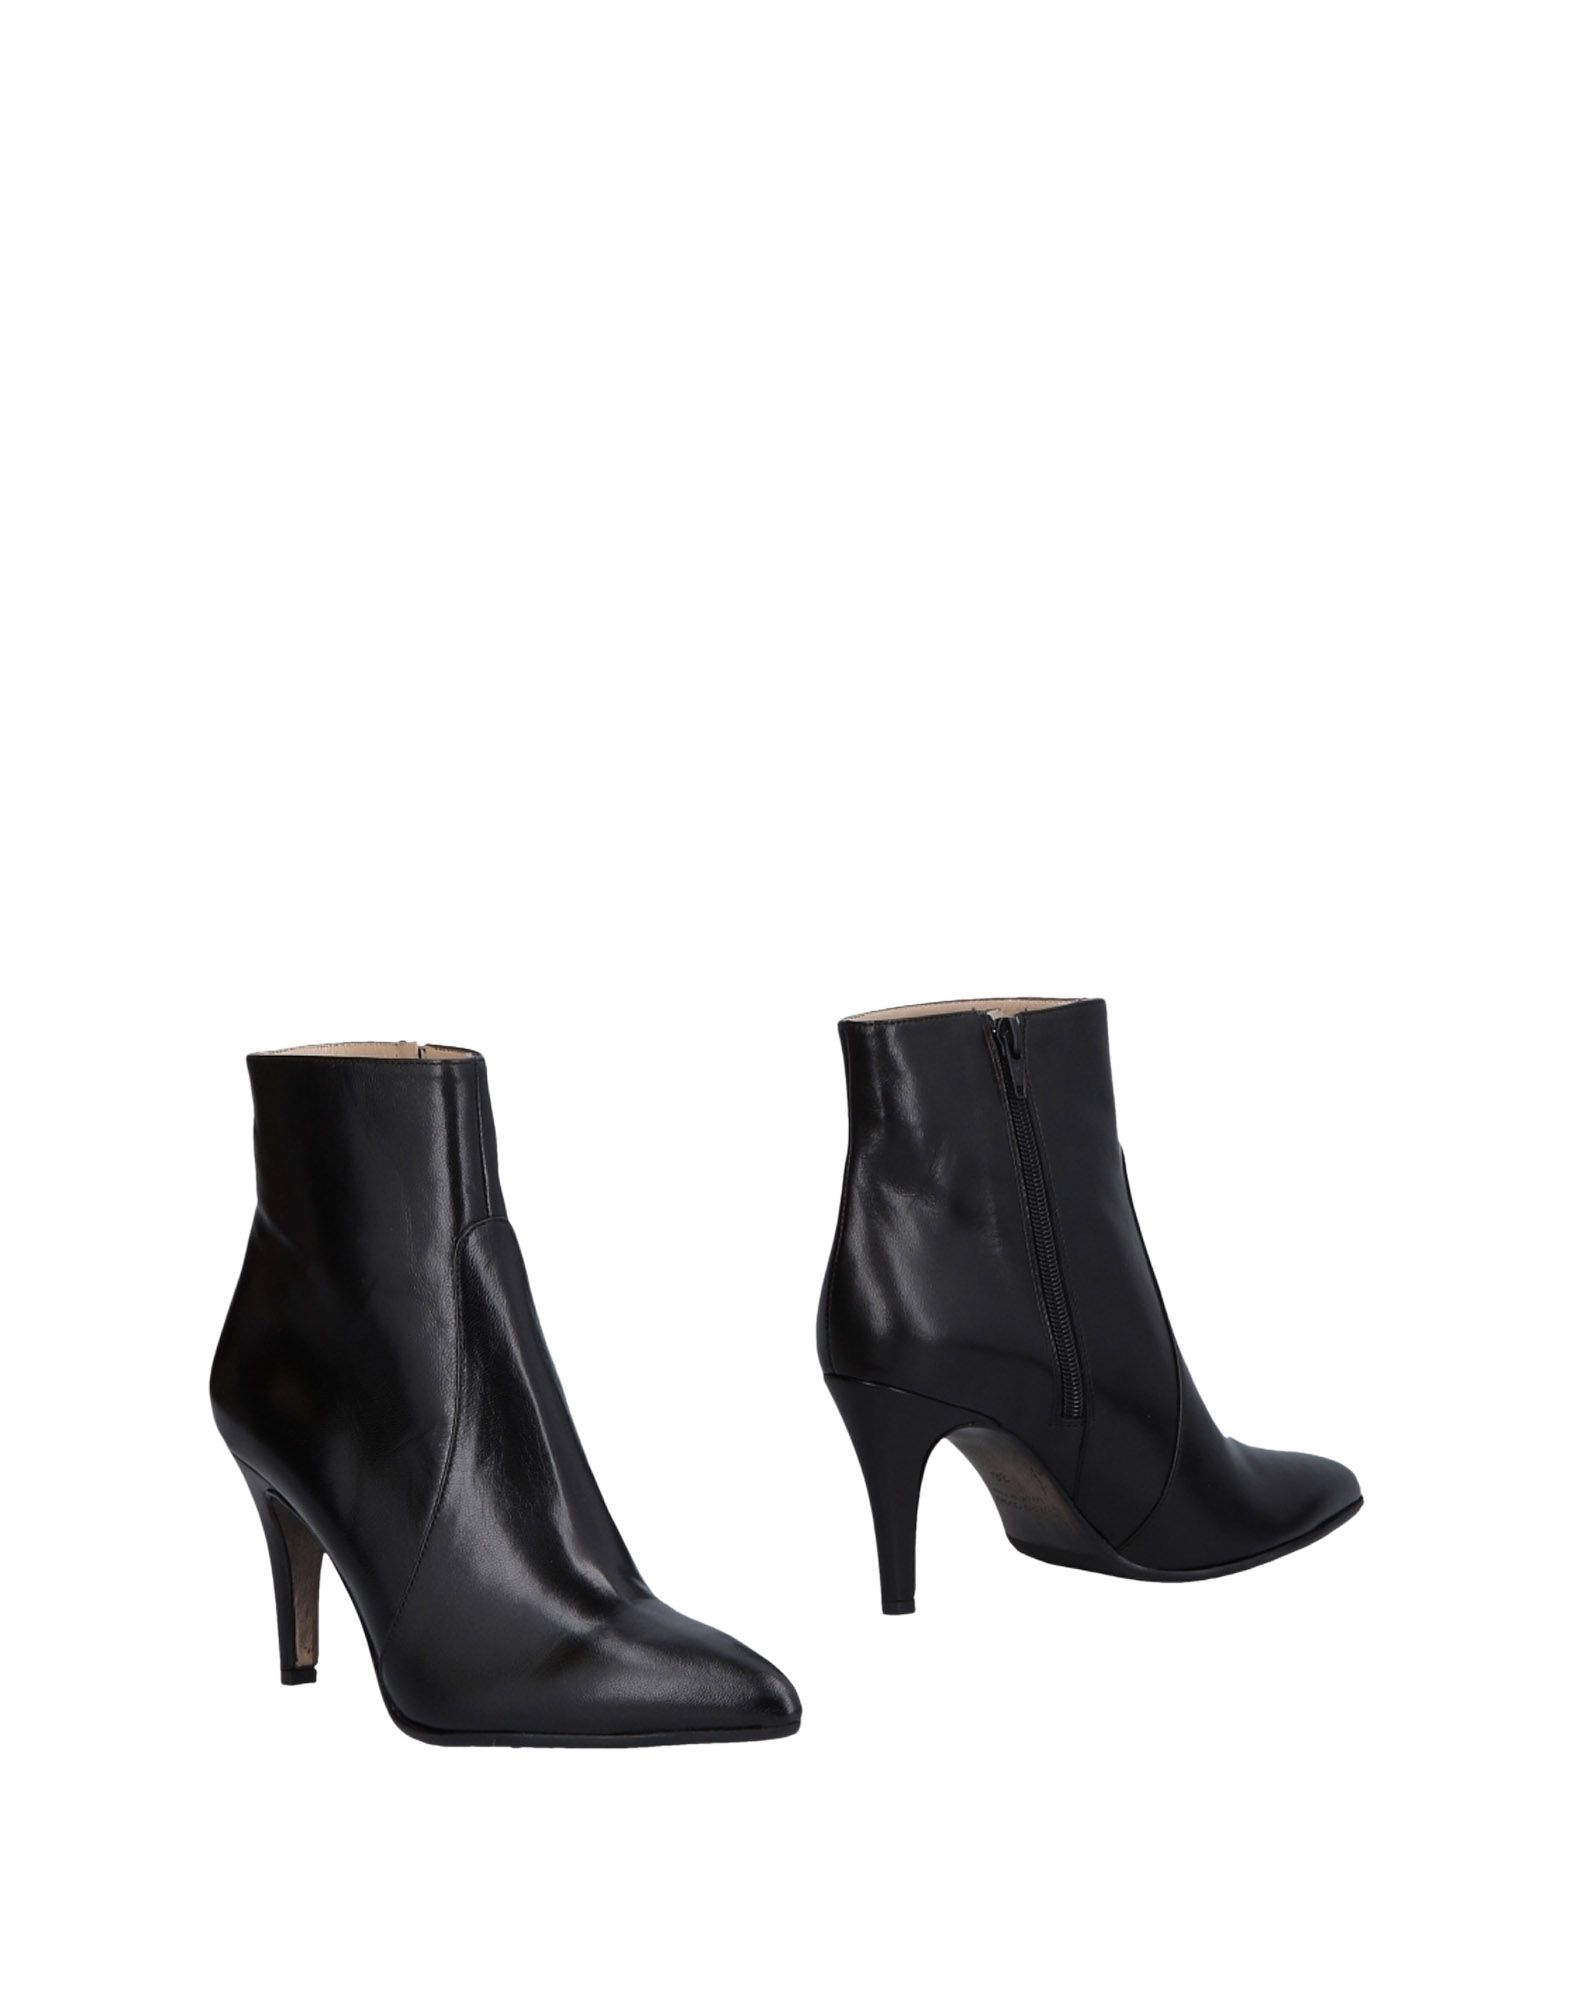 Rabatt Schuhe Stiefelette Arfango Stiefelette Schuhe Damen  11475337GW 5e5193